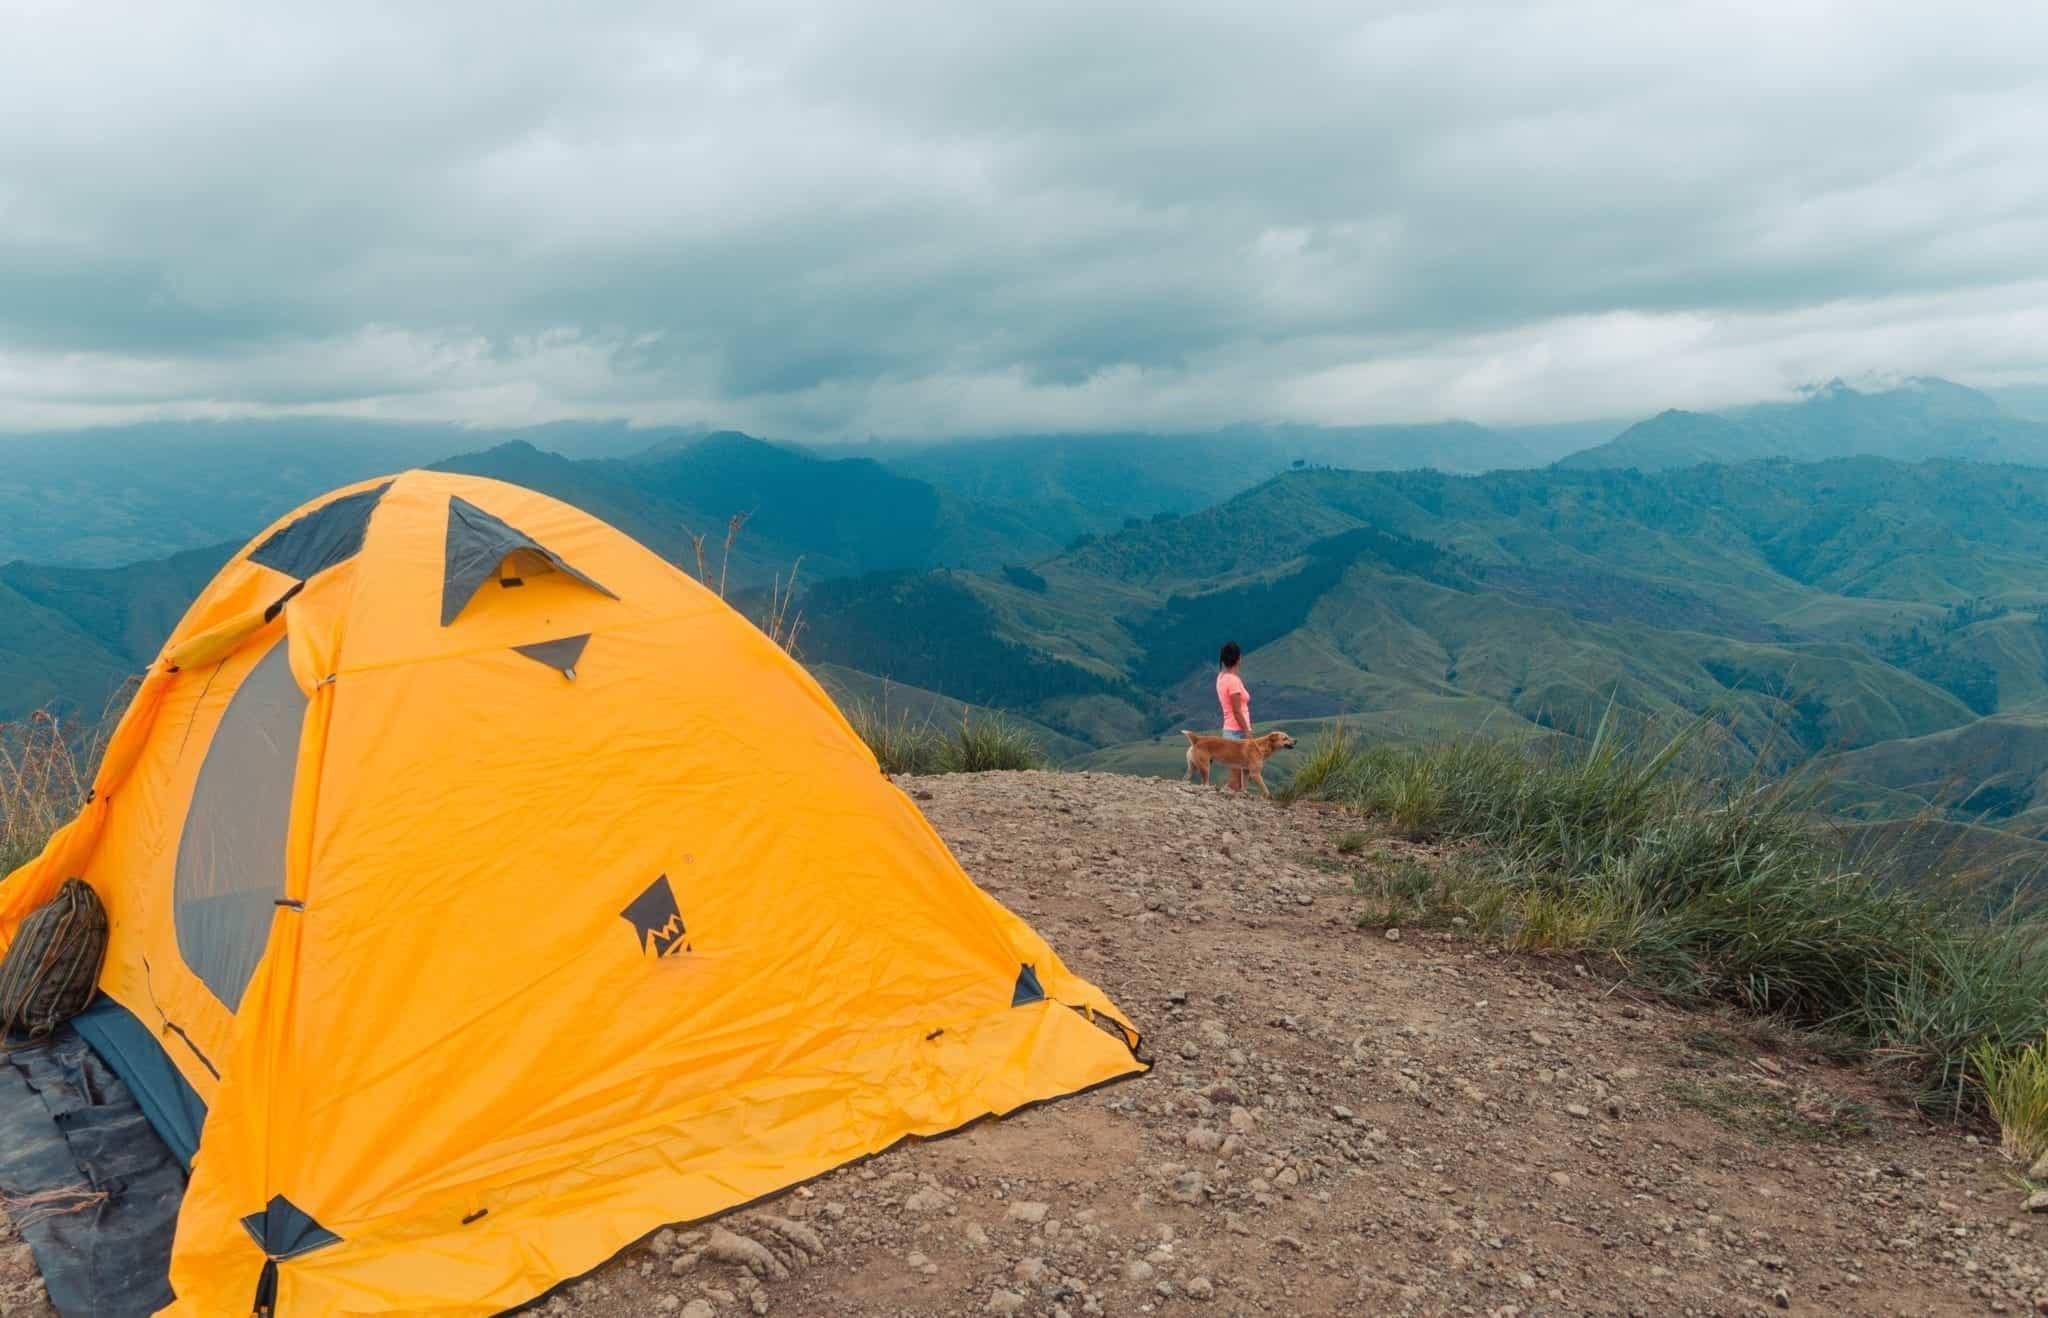 adventure-animal-camp-2496880 (1)